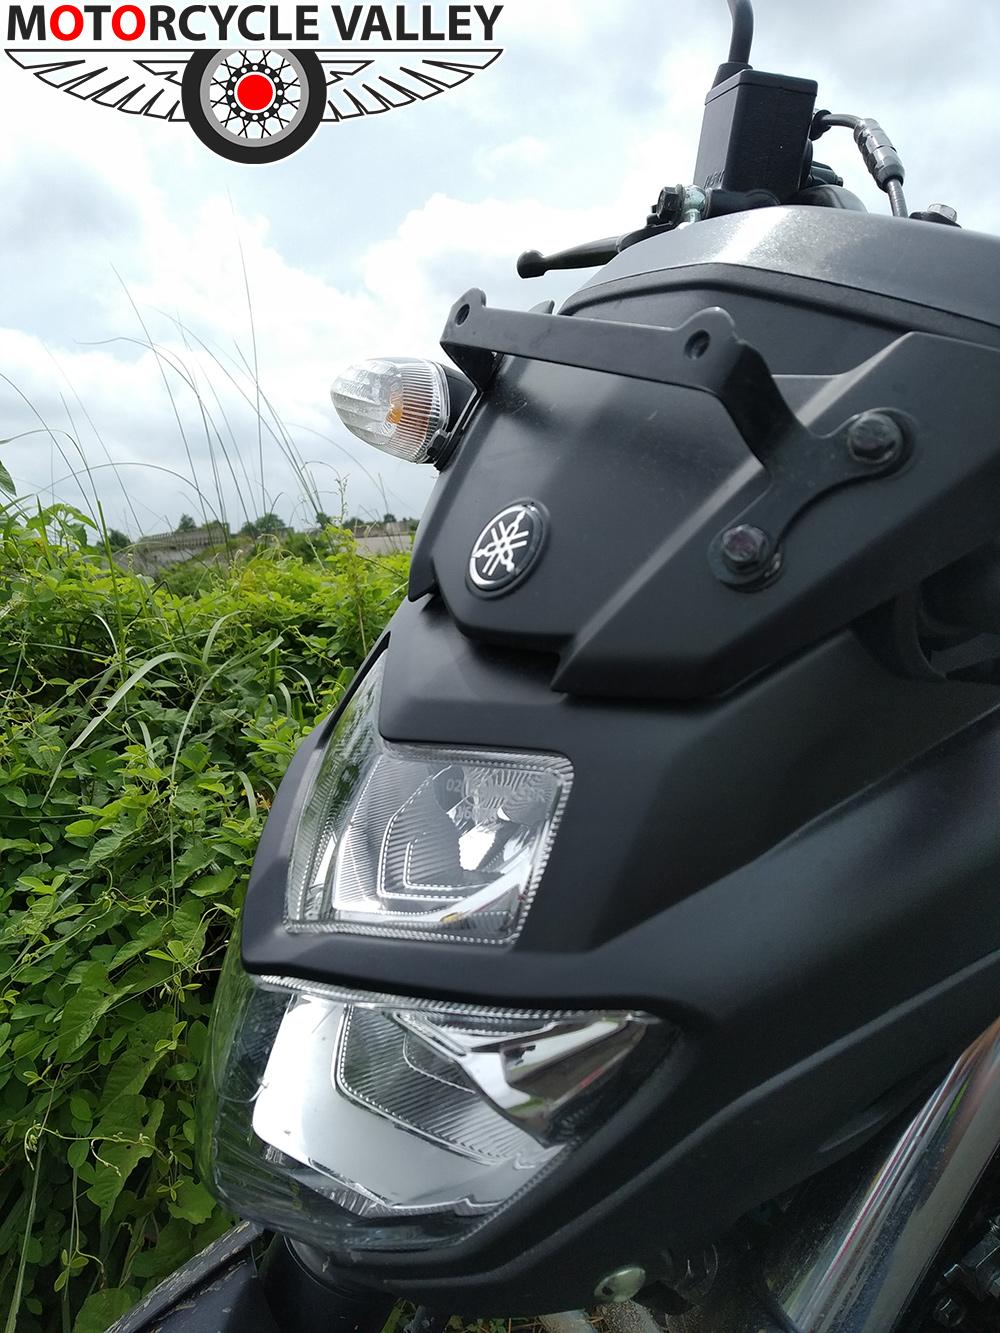 Yamaha-FZS-Fi-V3-6000km-riding-experiences-review-by-Shahabuddin-Pappu-Front